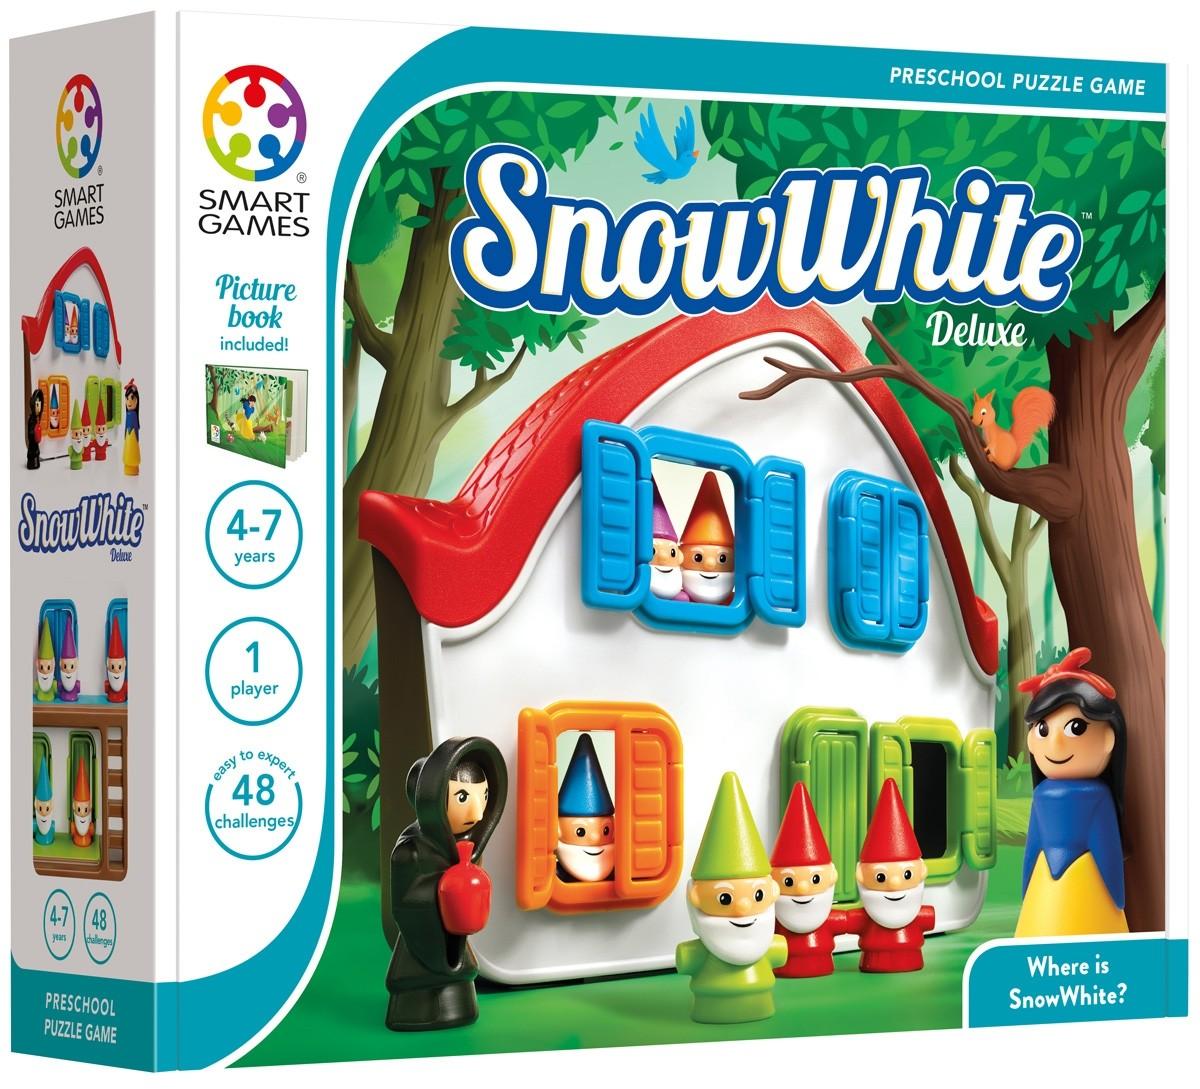 Snow White - Desafios de Lógica para Pequenos